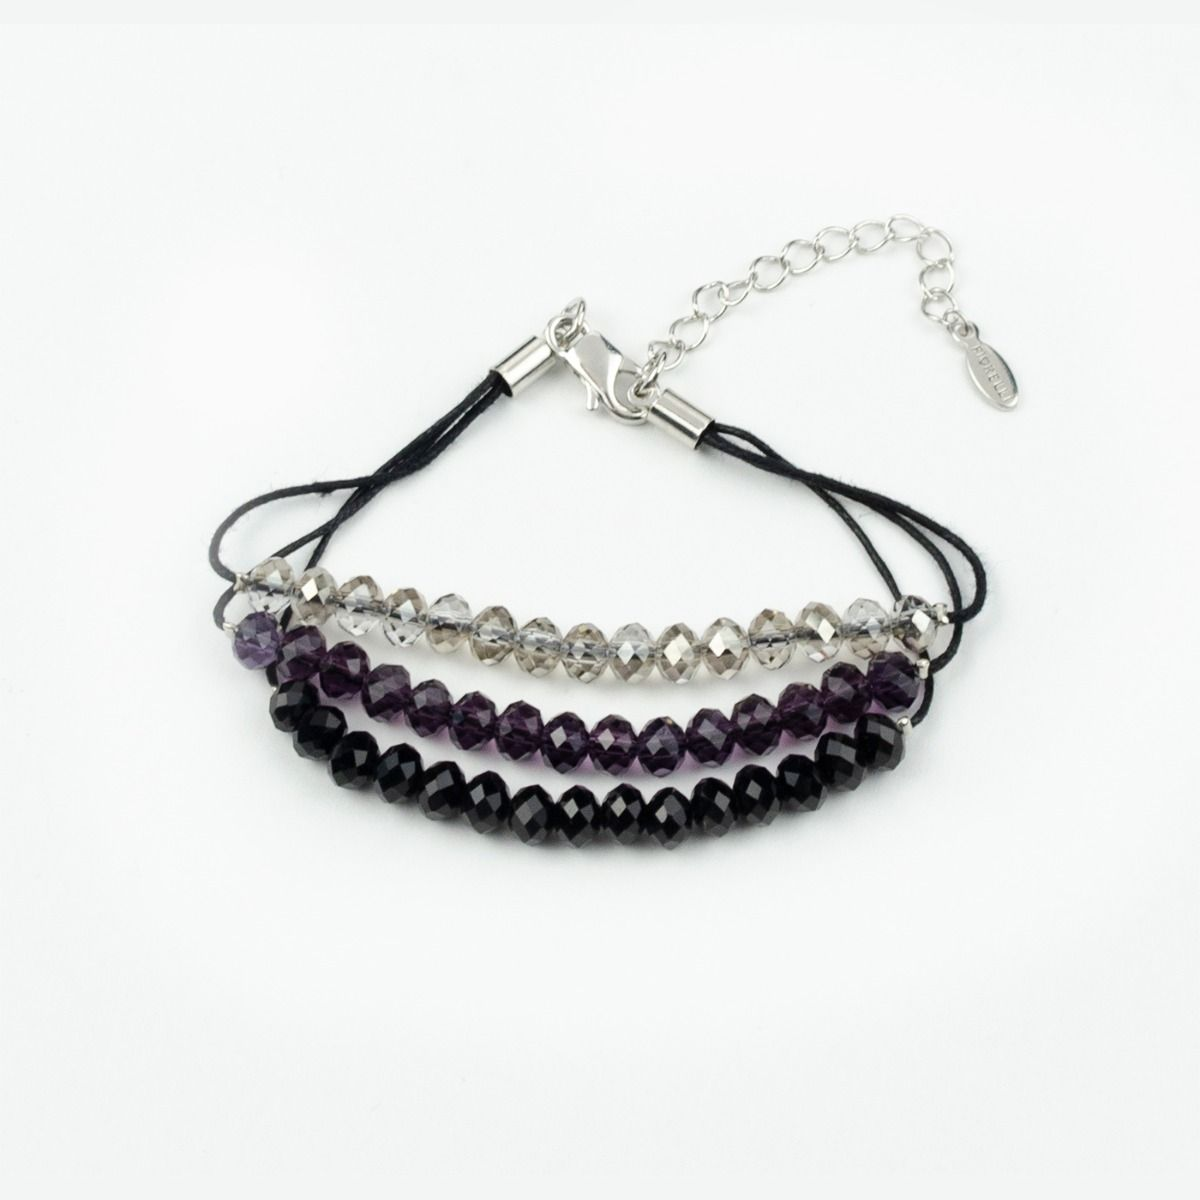 Fiorelli Fashion Three Tone Beaded Cord Bracelet 18cm + 5cm